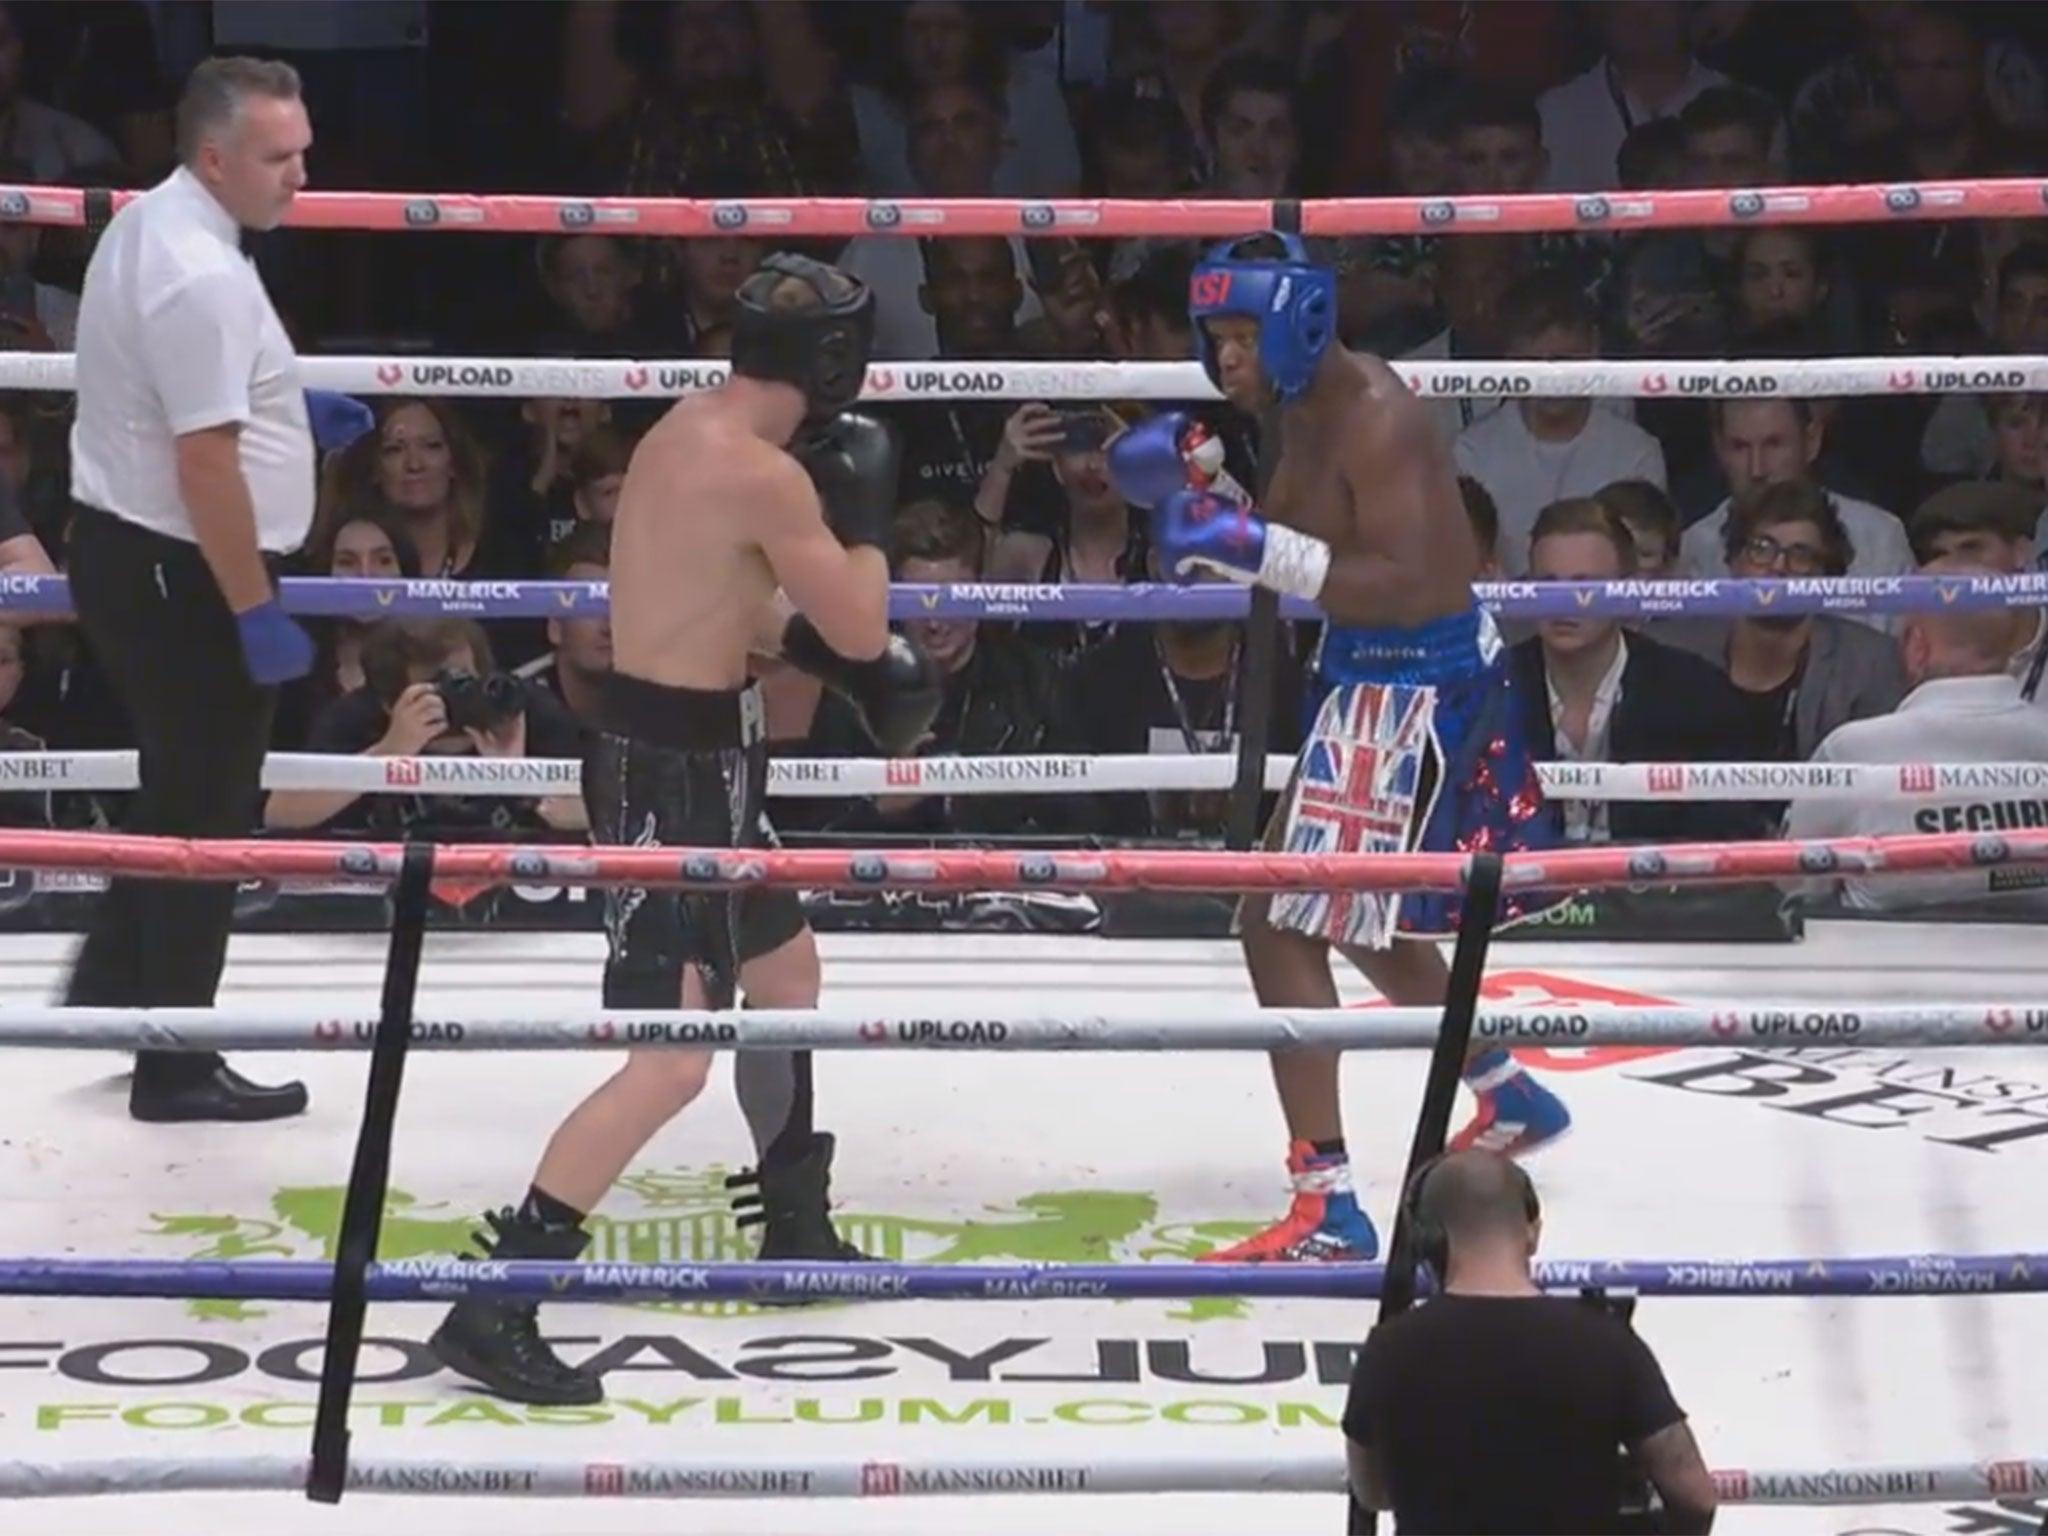 KSI vs Logan Paul: Battle of YouTube stars ends in draw – as